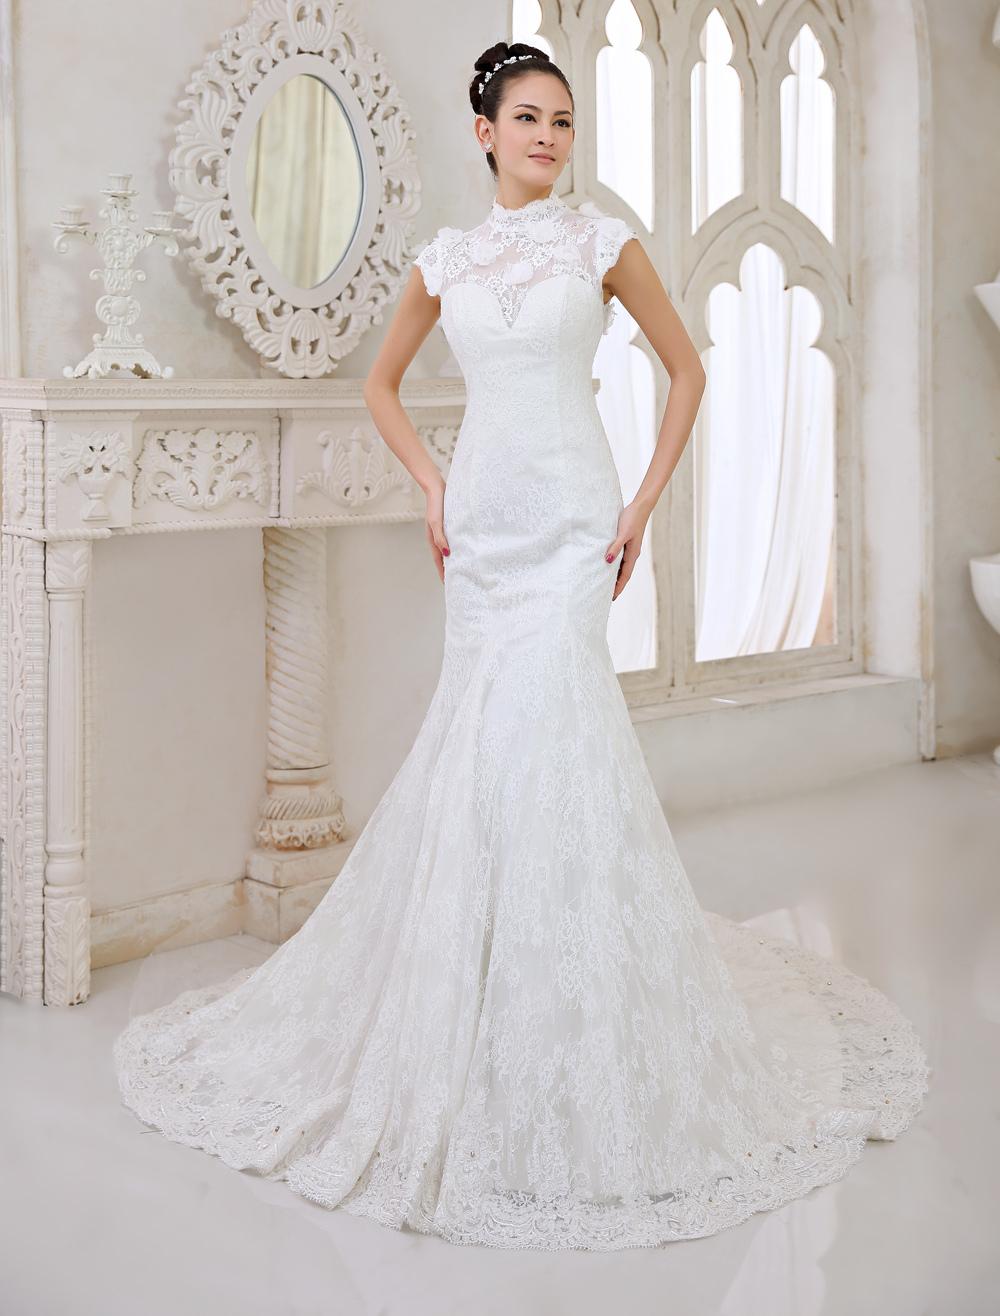 Ivory Mermaid High Collar Flower Chapel Train Wedding Dress For Bride  Milanoo